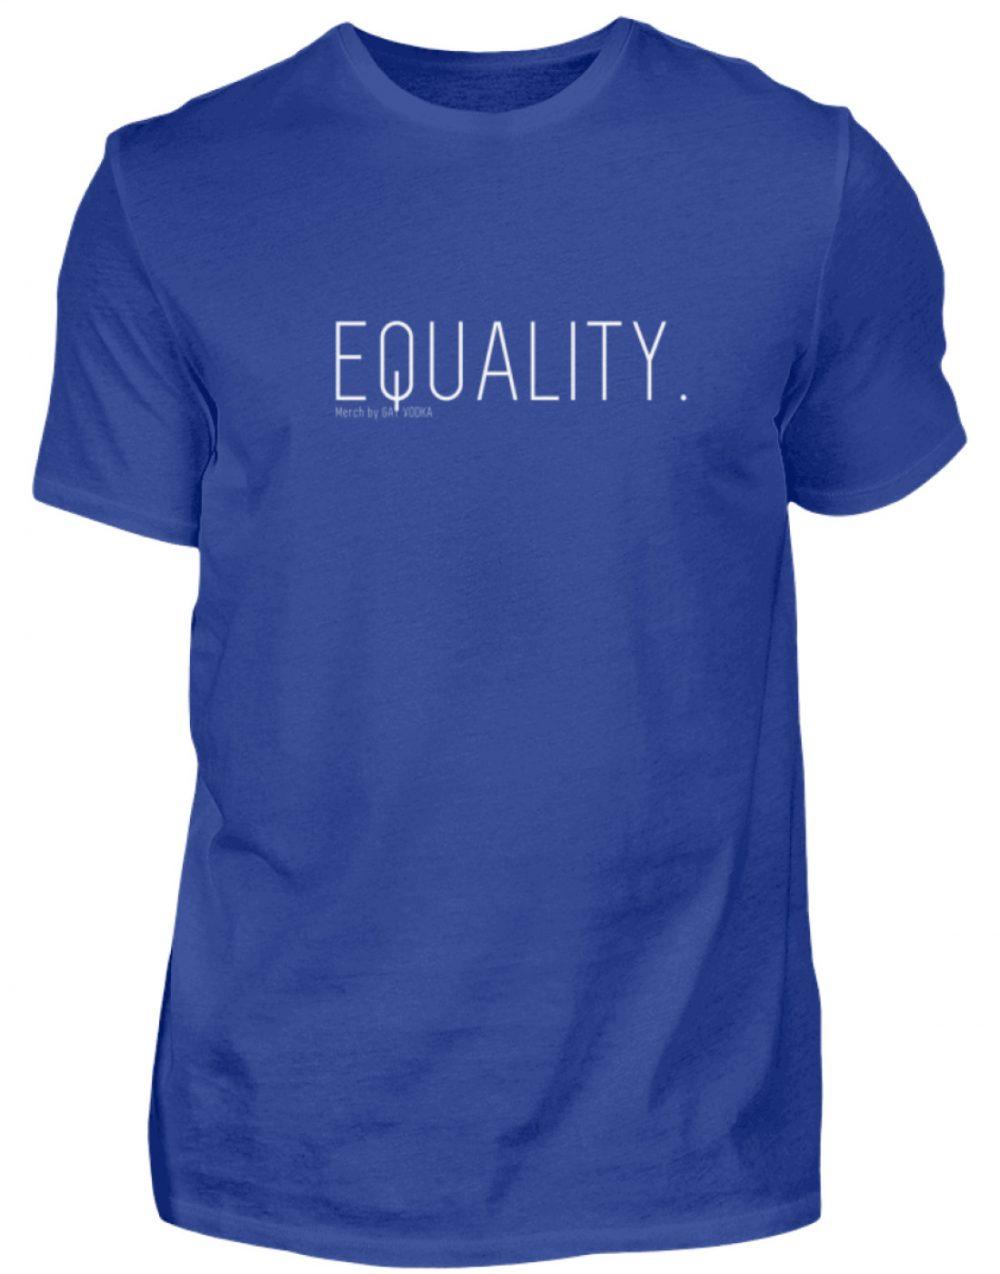 EQUALITY. - Herren Premiumshirt-27